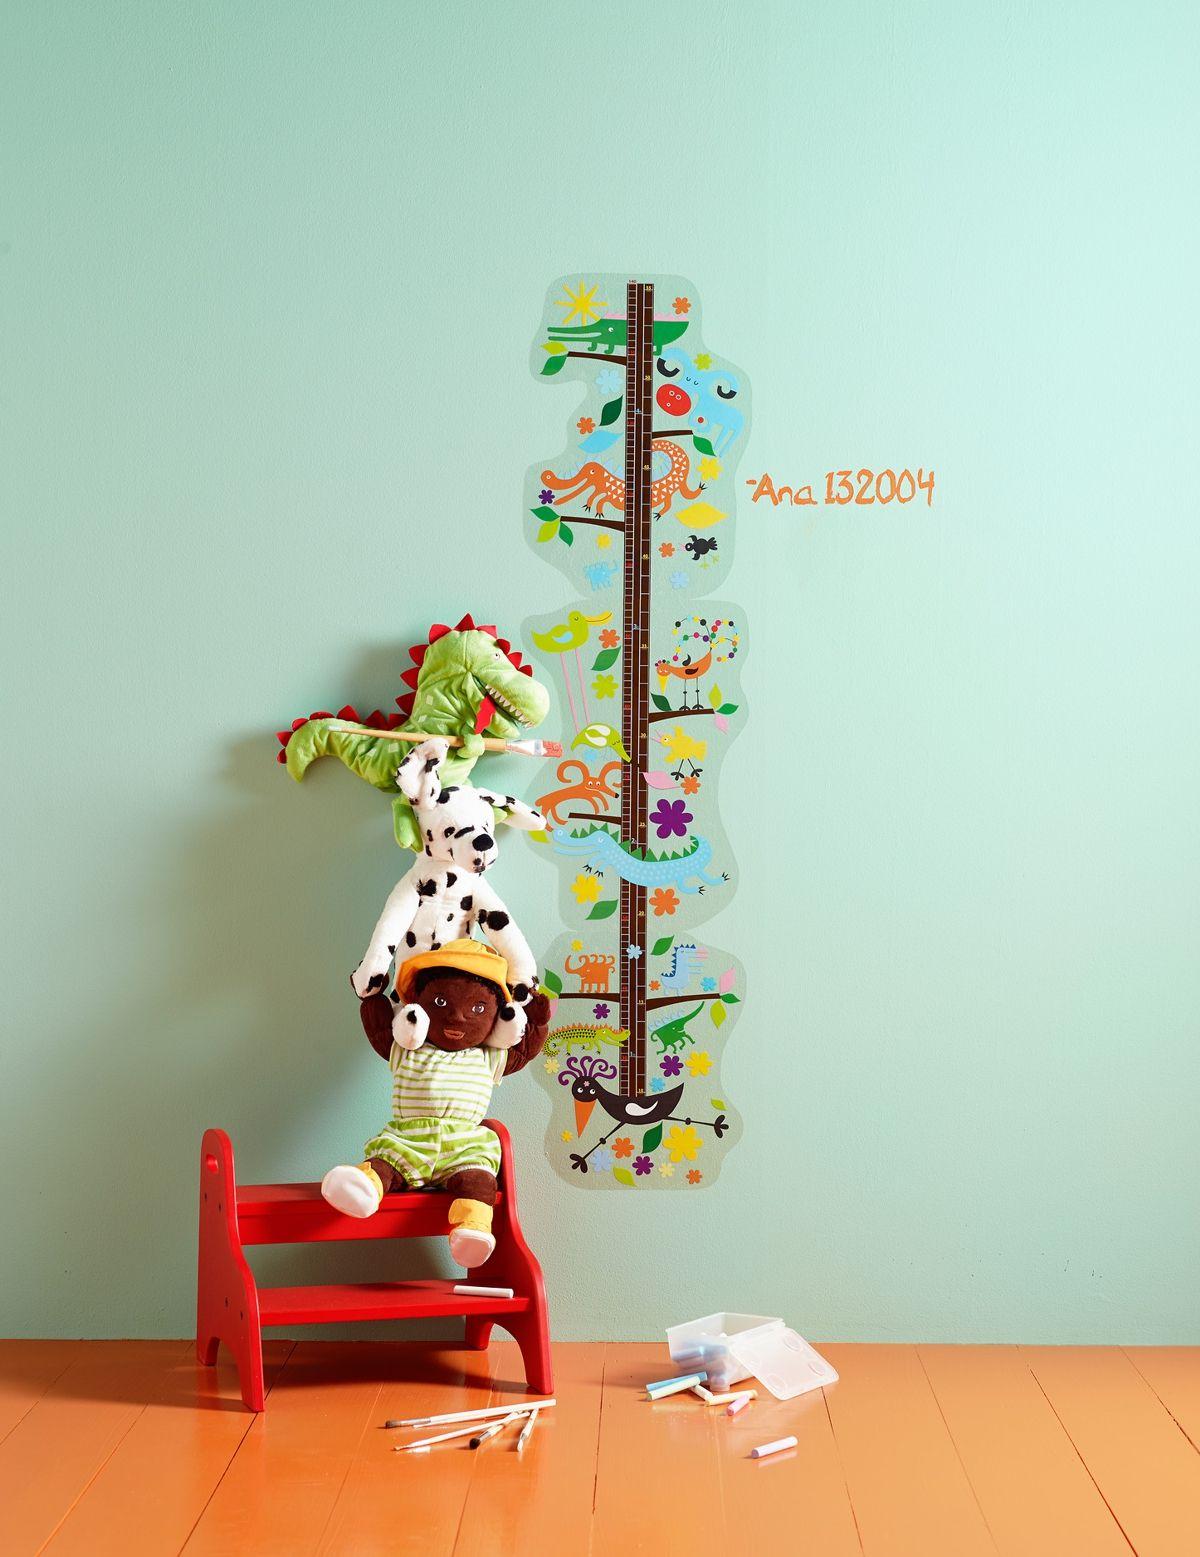 vinilos decorativos de Ikea - mod. ROKNÄS | hogar | Pinterest